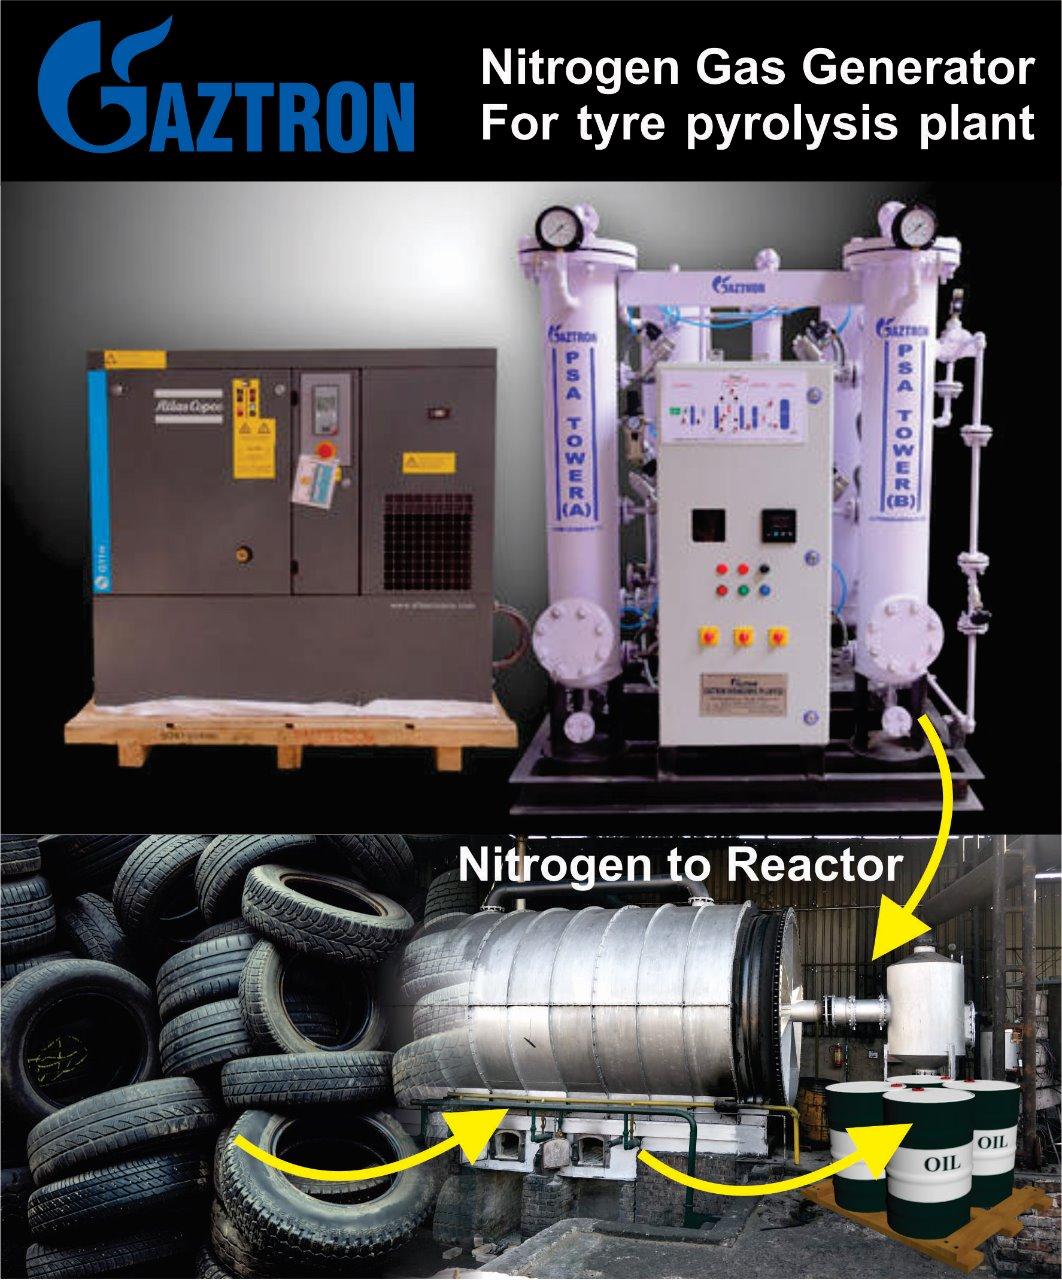 Nitrogen Gas Generator for Tyre Pyrolysis plants